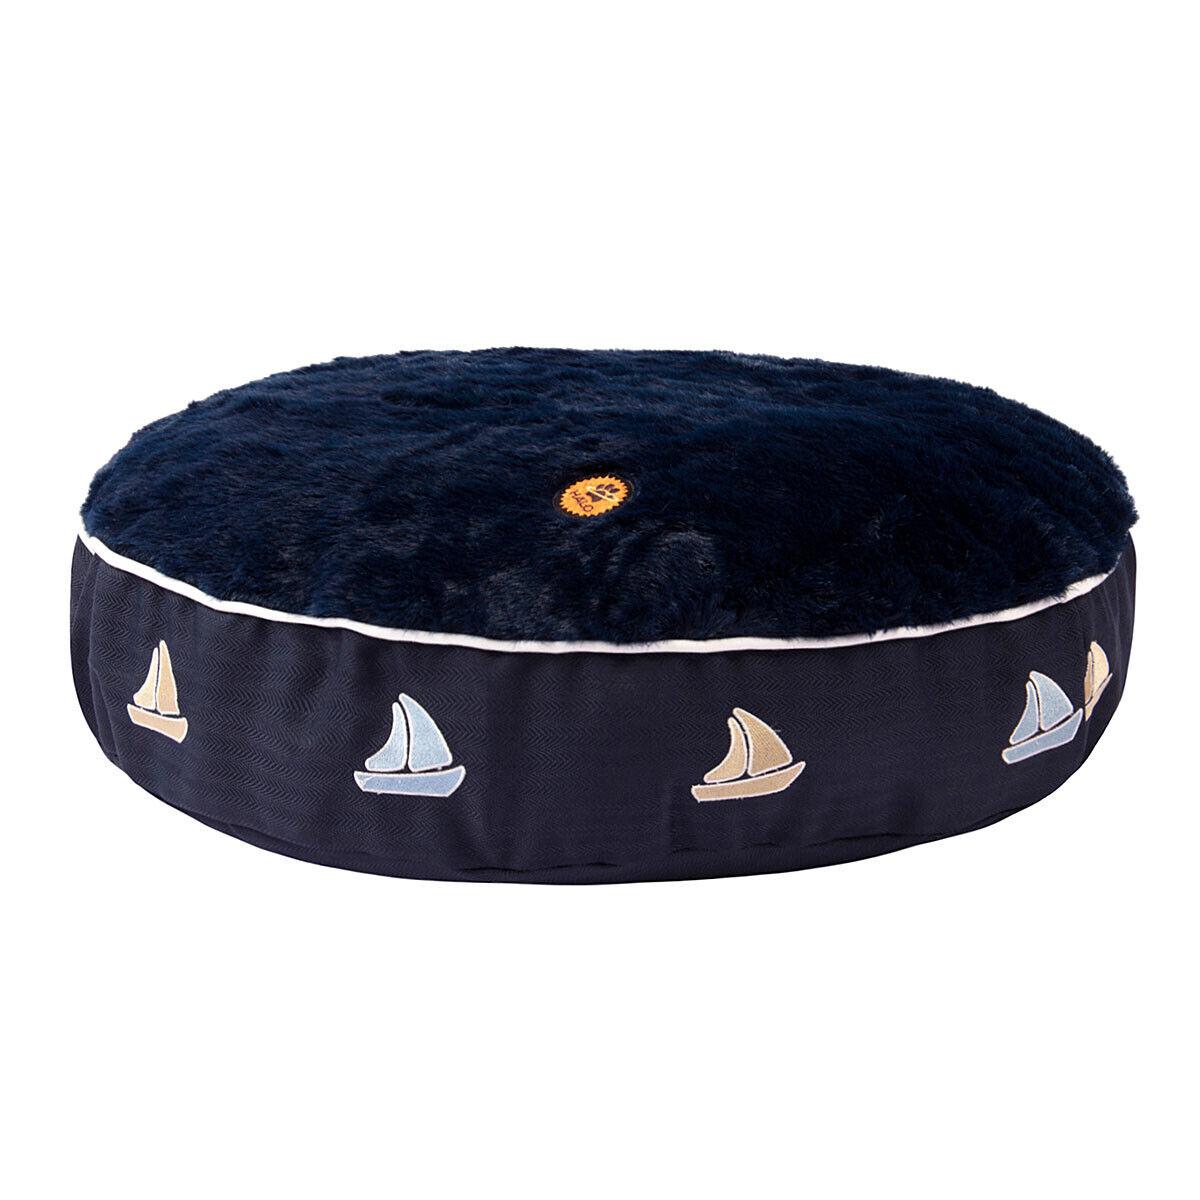 Halo Round Bon Voyage Dog Bed...